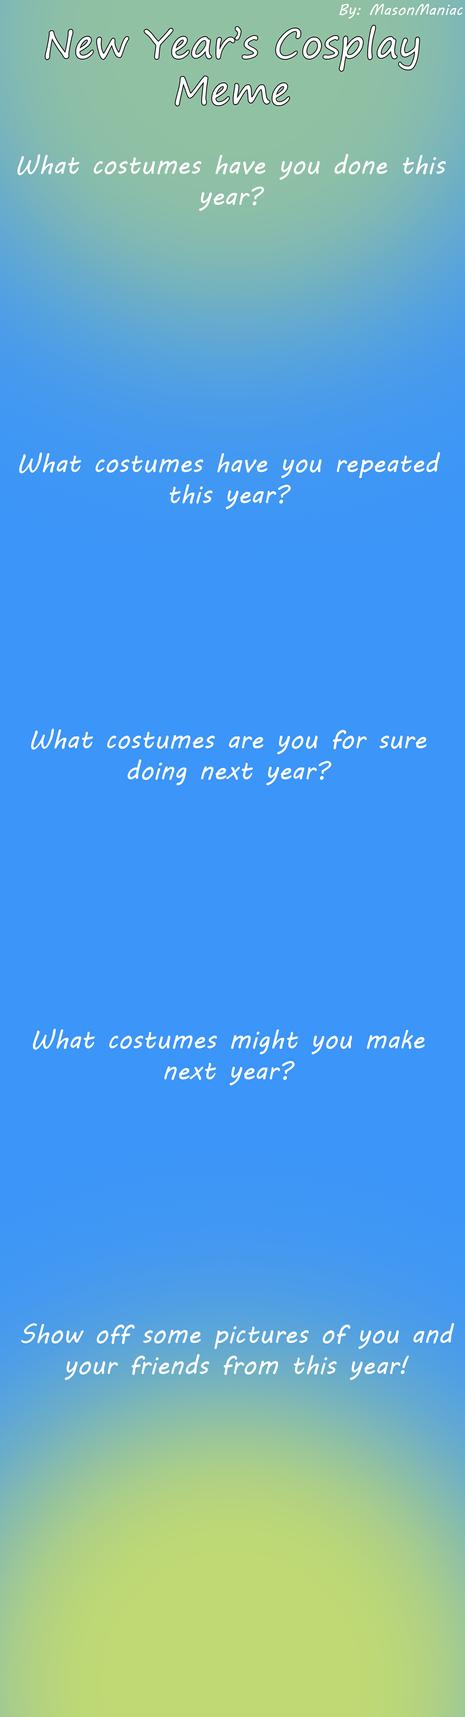 New Year's cosplay meme blank by MasonManiac